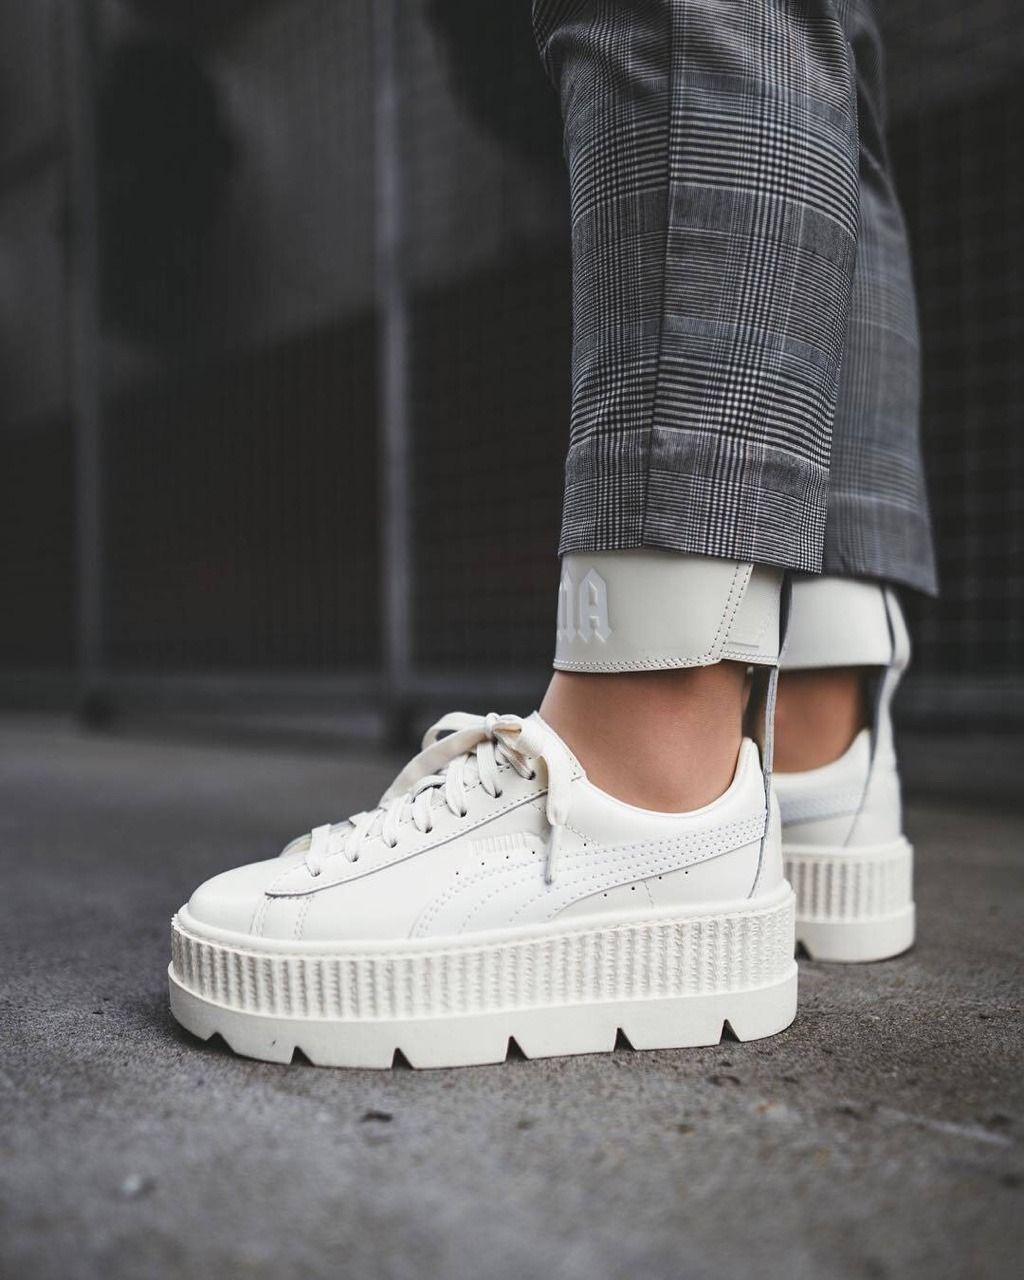 chaussure puma creeper femme